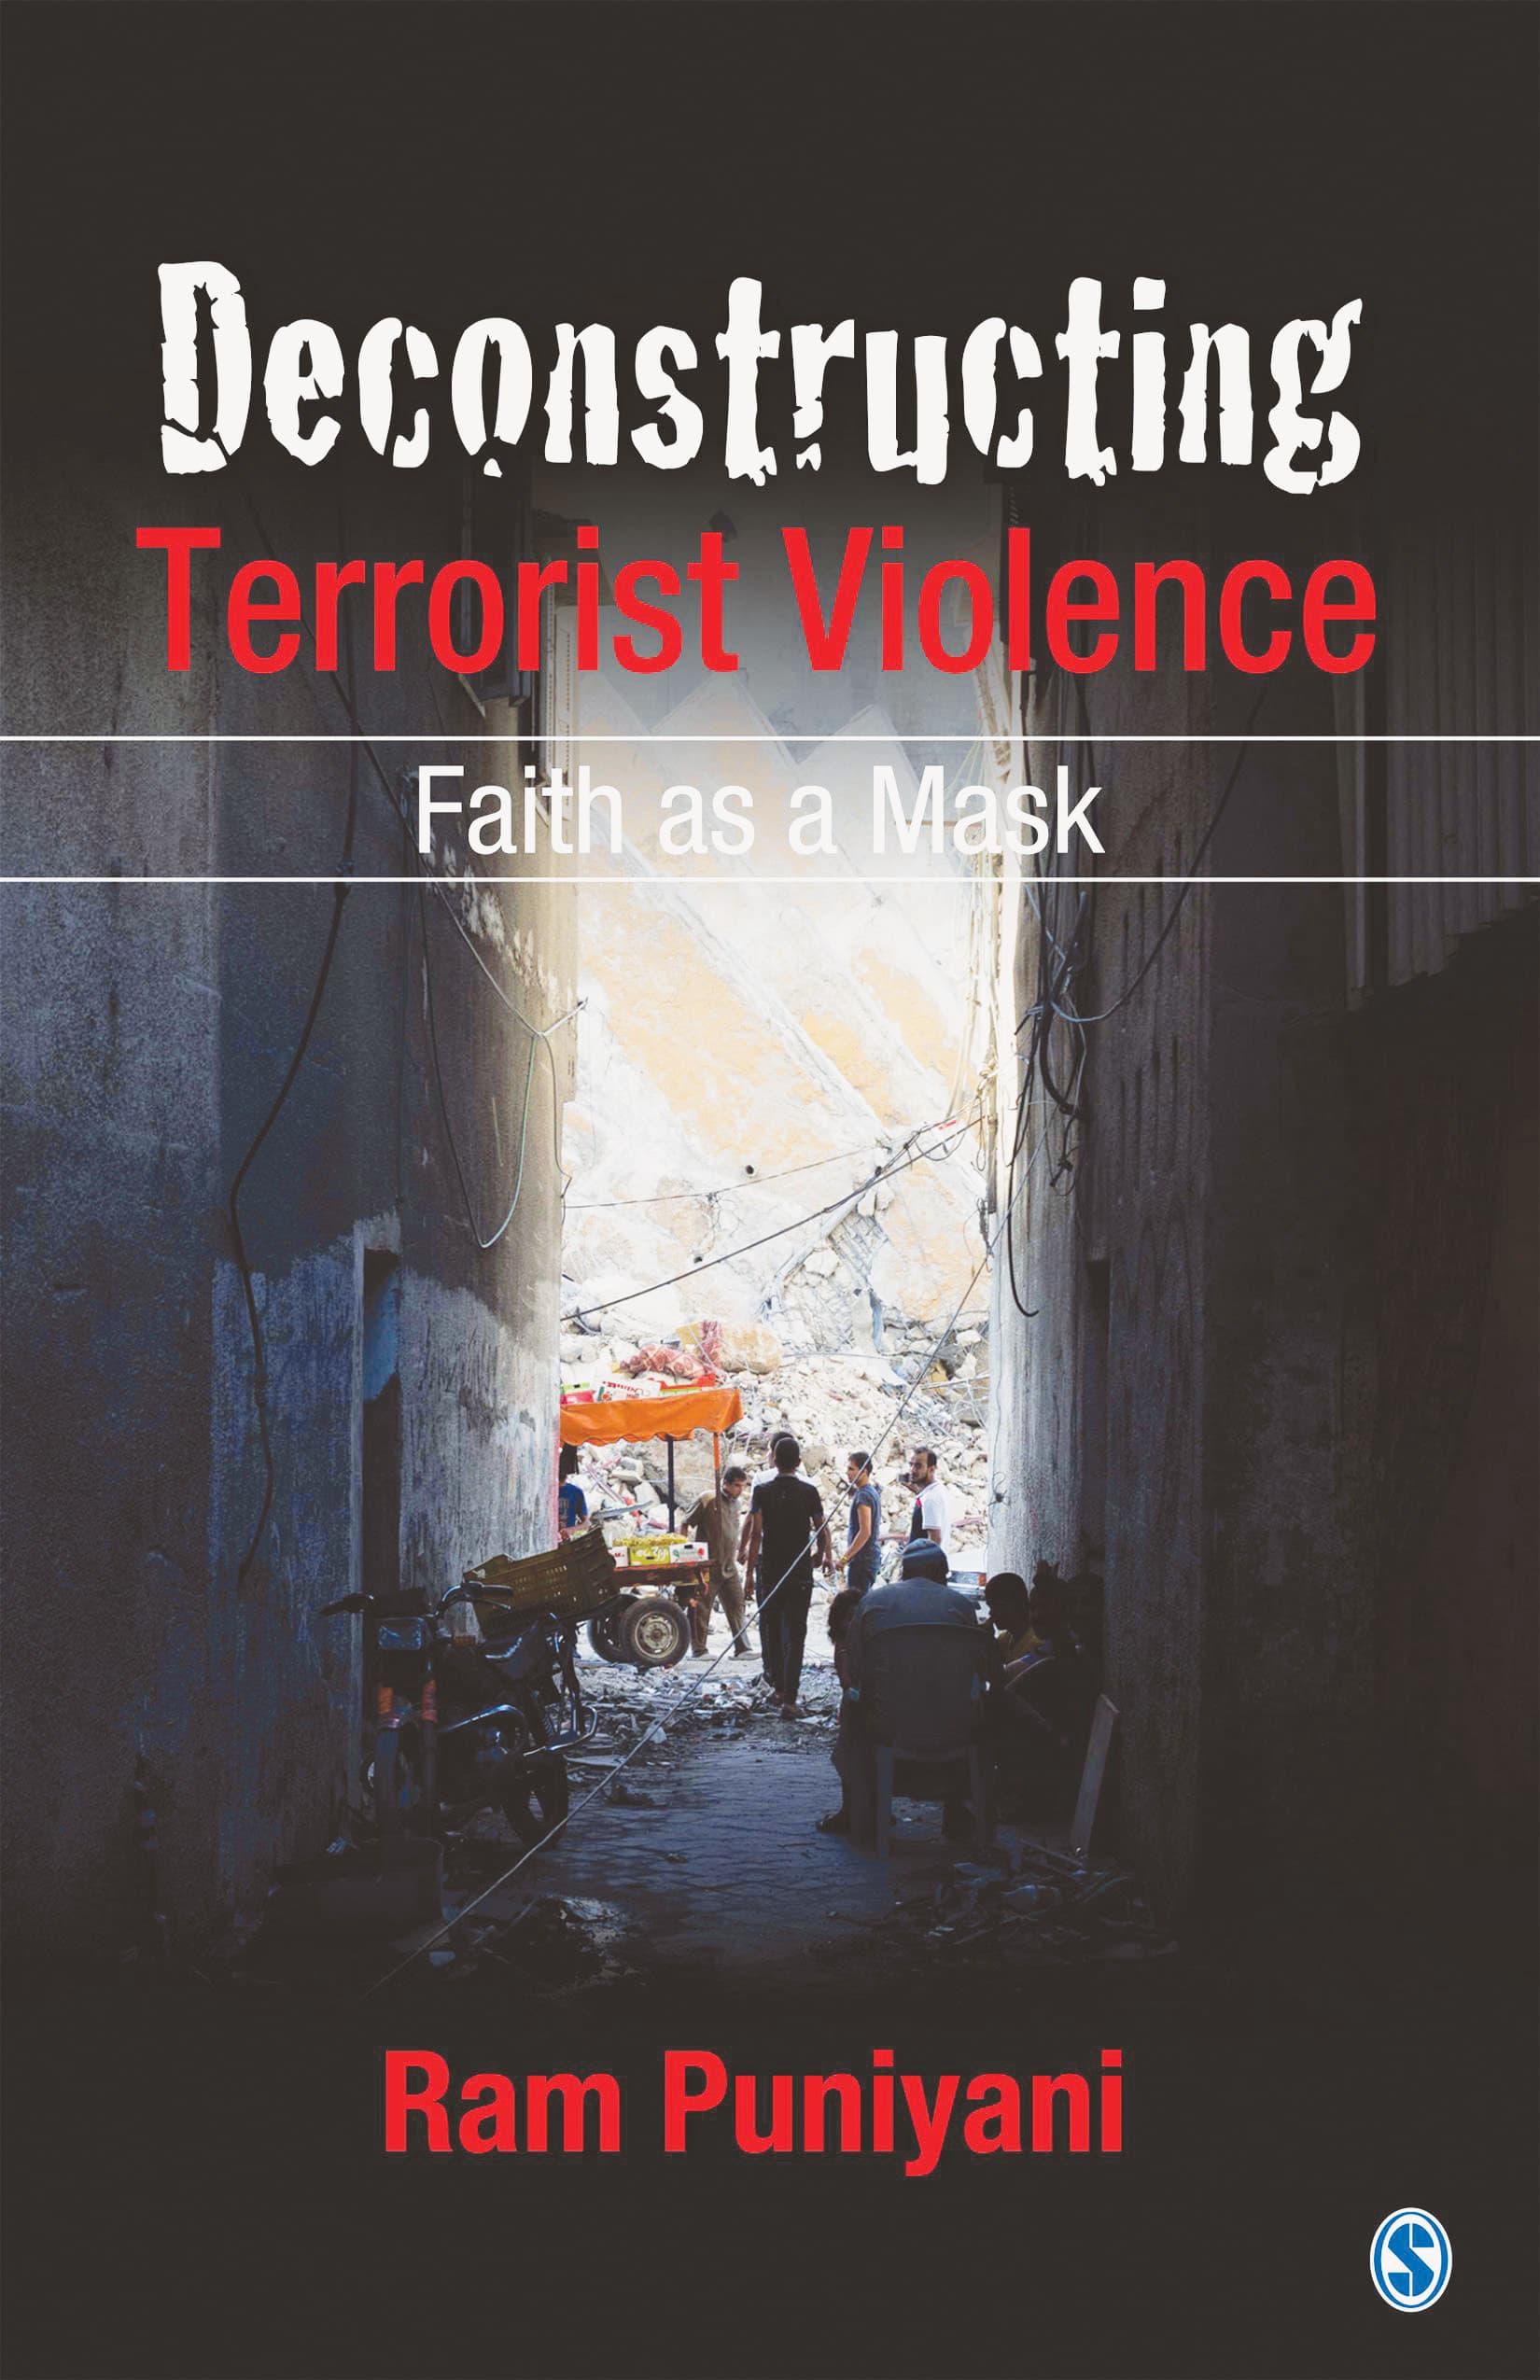 Deconstructing Terrorist Violence: Faith  as a Mask   By Ram Puniyani